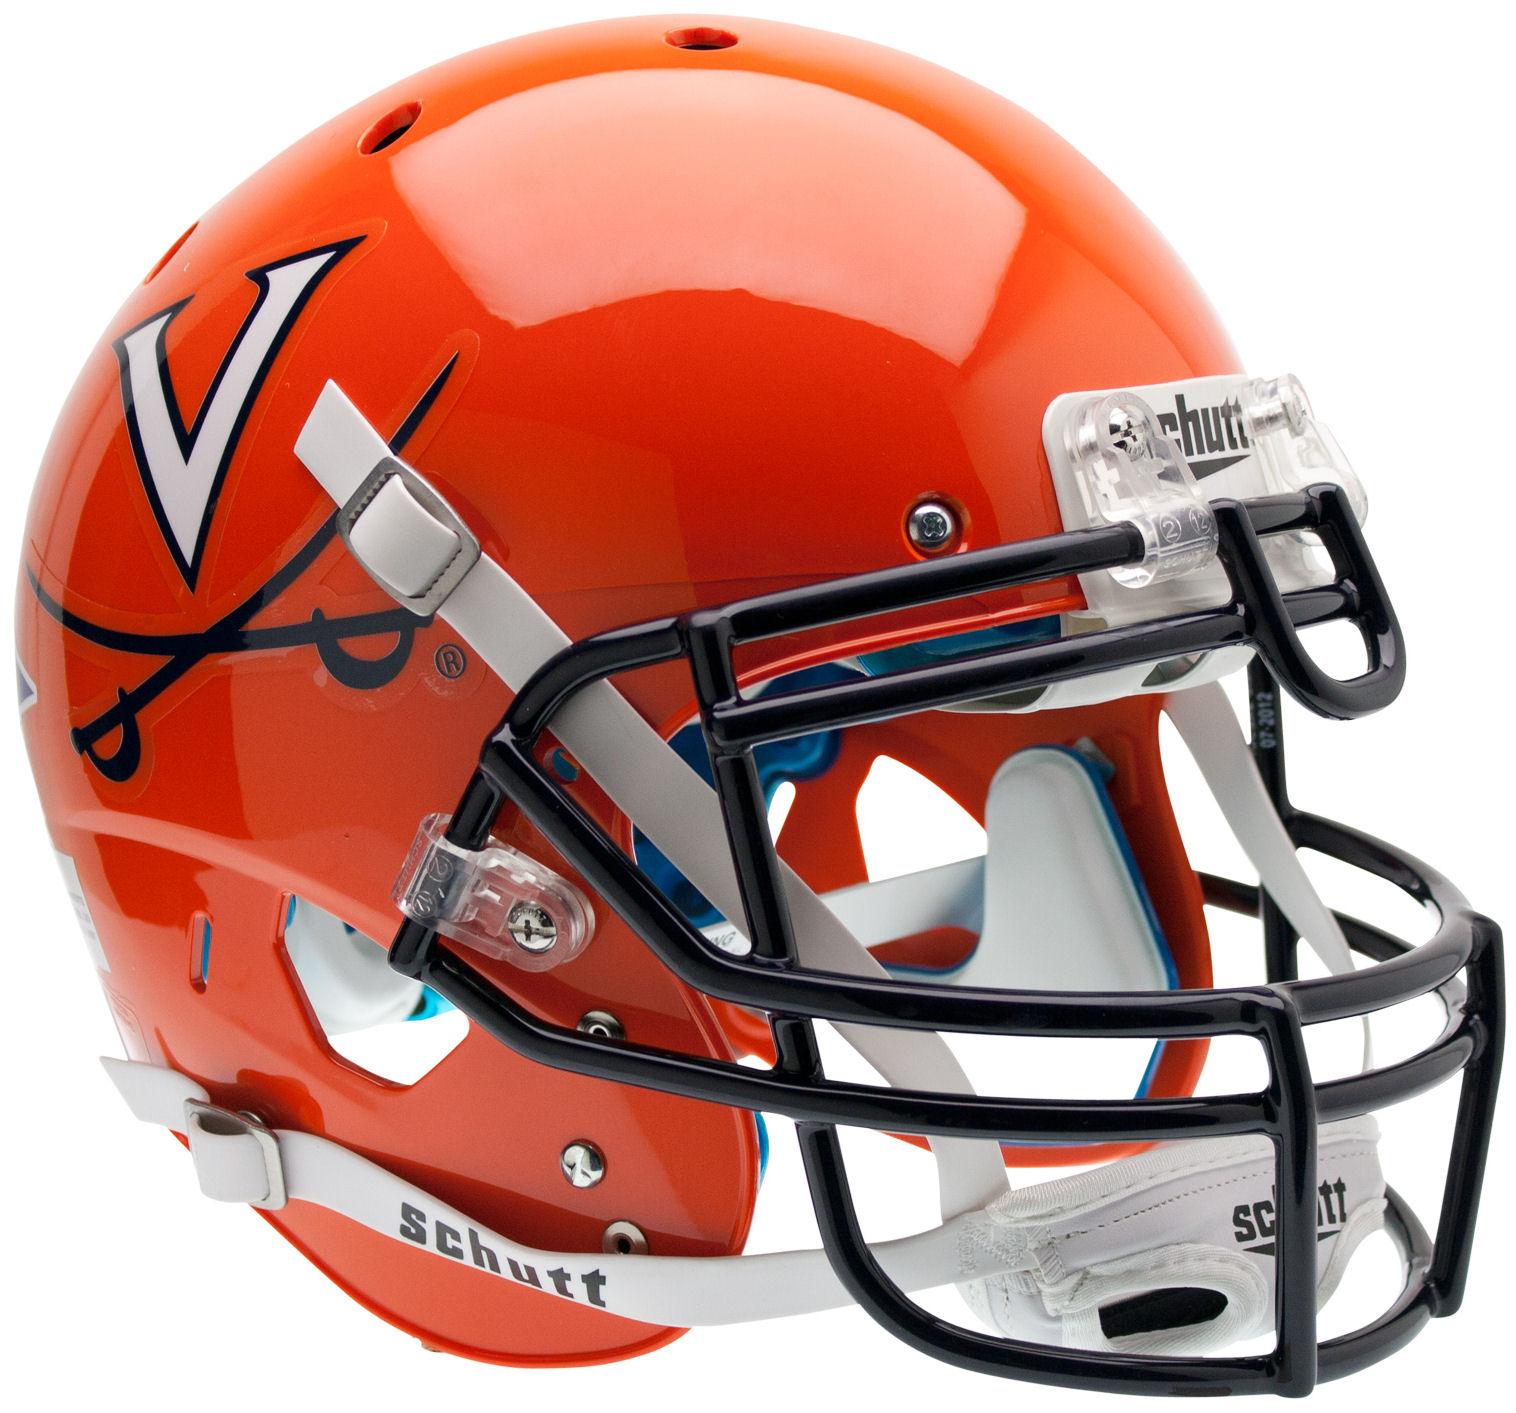 Virginia Cavaliers Authentic College XP Football Helmet Schutt <B>Orange</B>